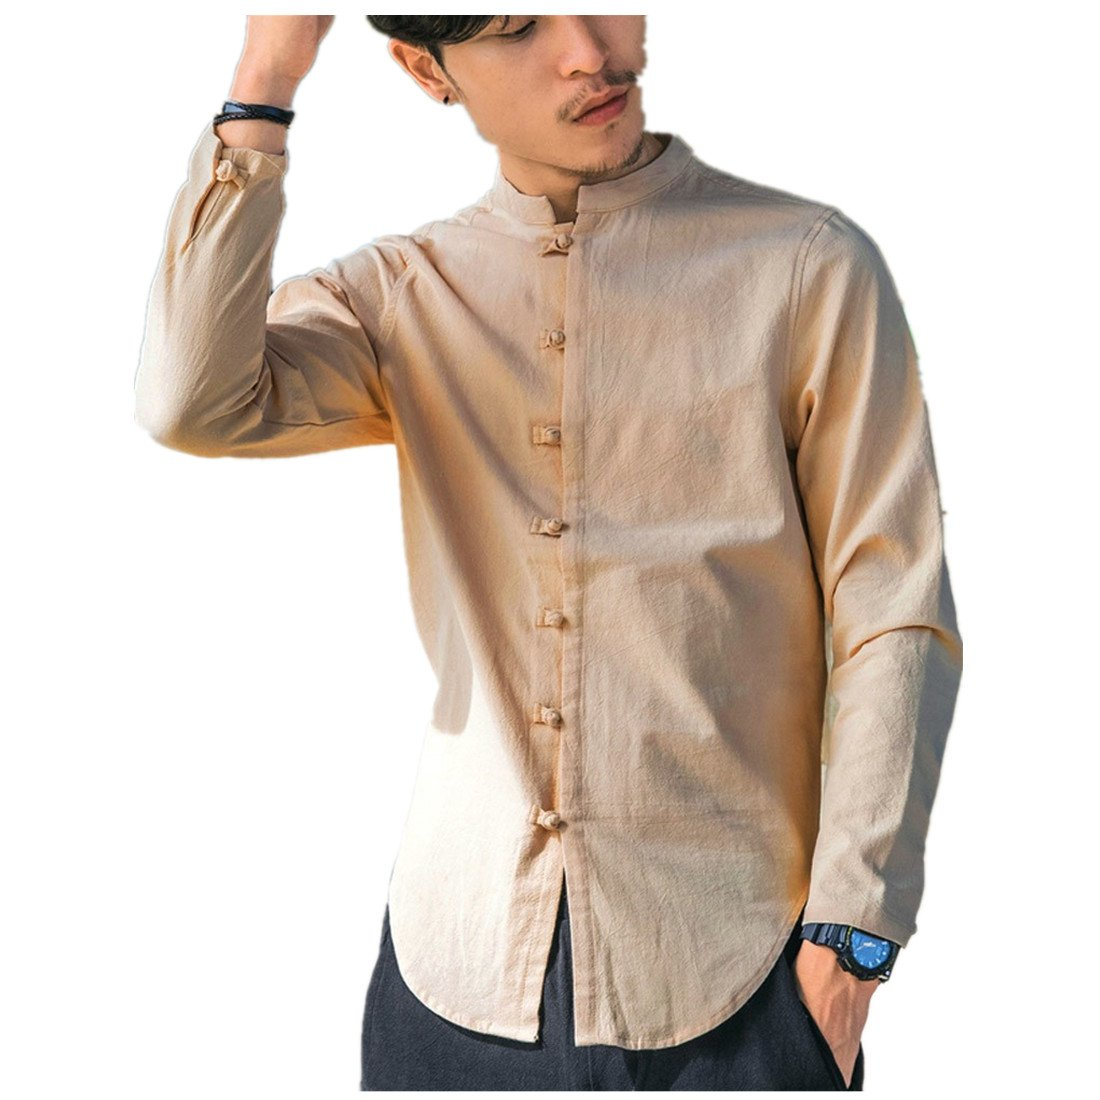 Clearance Vintage T Shirts for Men vermers Men's Casual Tops Summer Long Sleeve T-Shirt Button Linen Solid Blouse(5XL, Khaki)